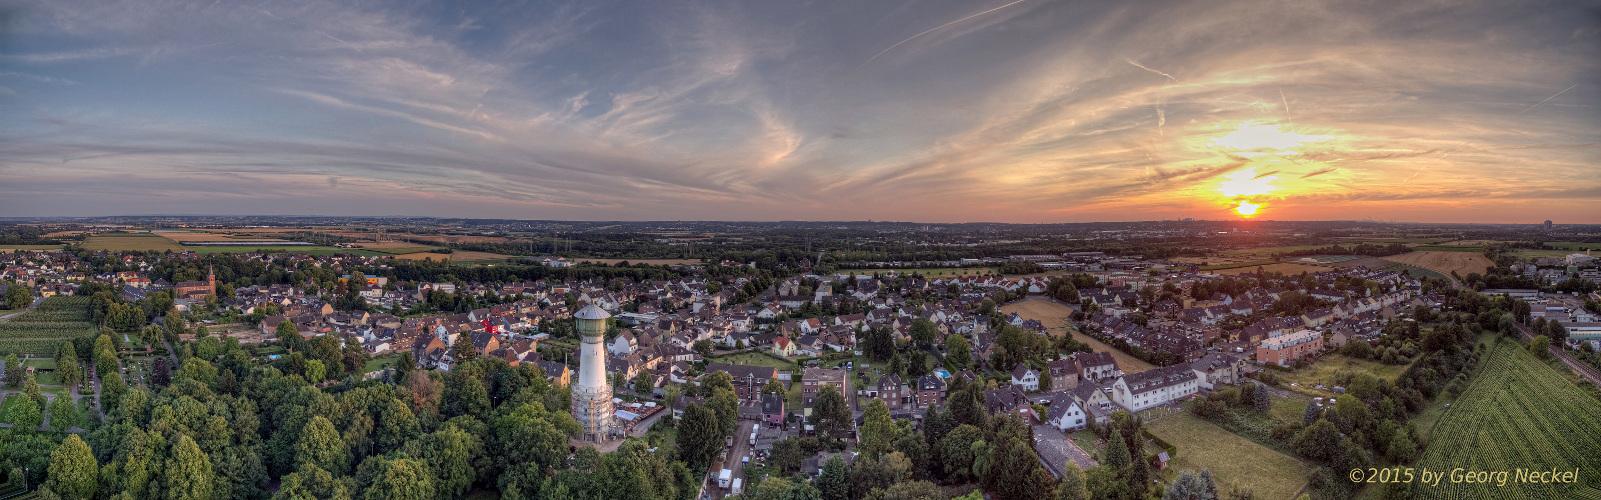 Berzdorf Sunset